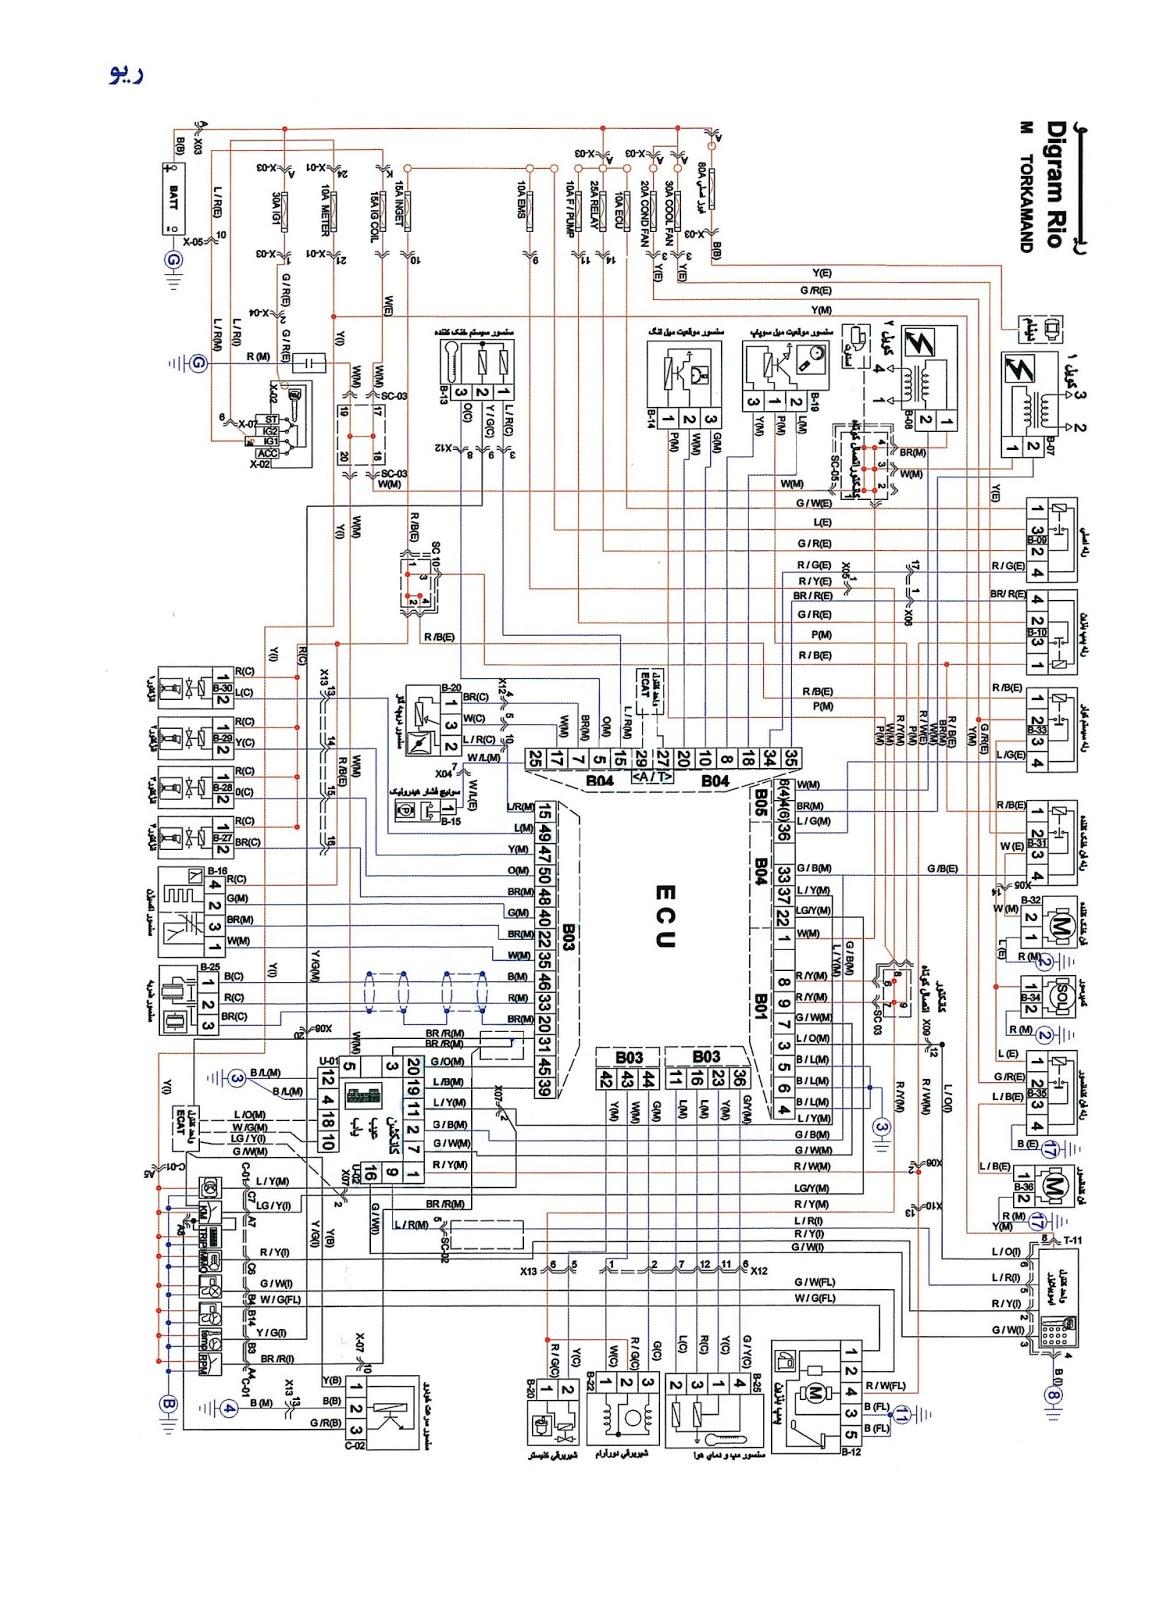 auto electrical repairs  automotive wiring maps of kia rio